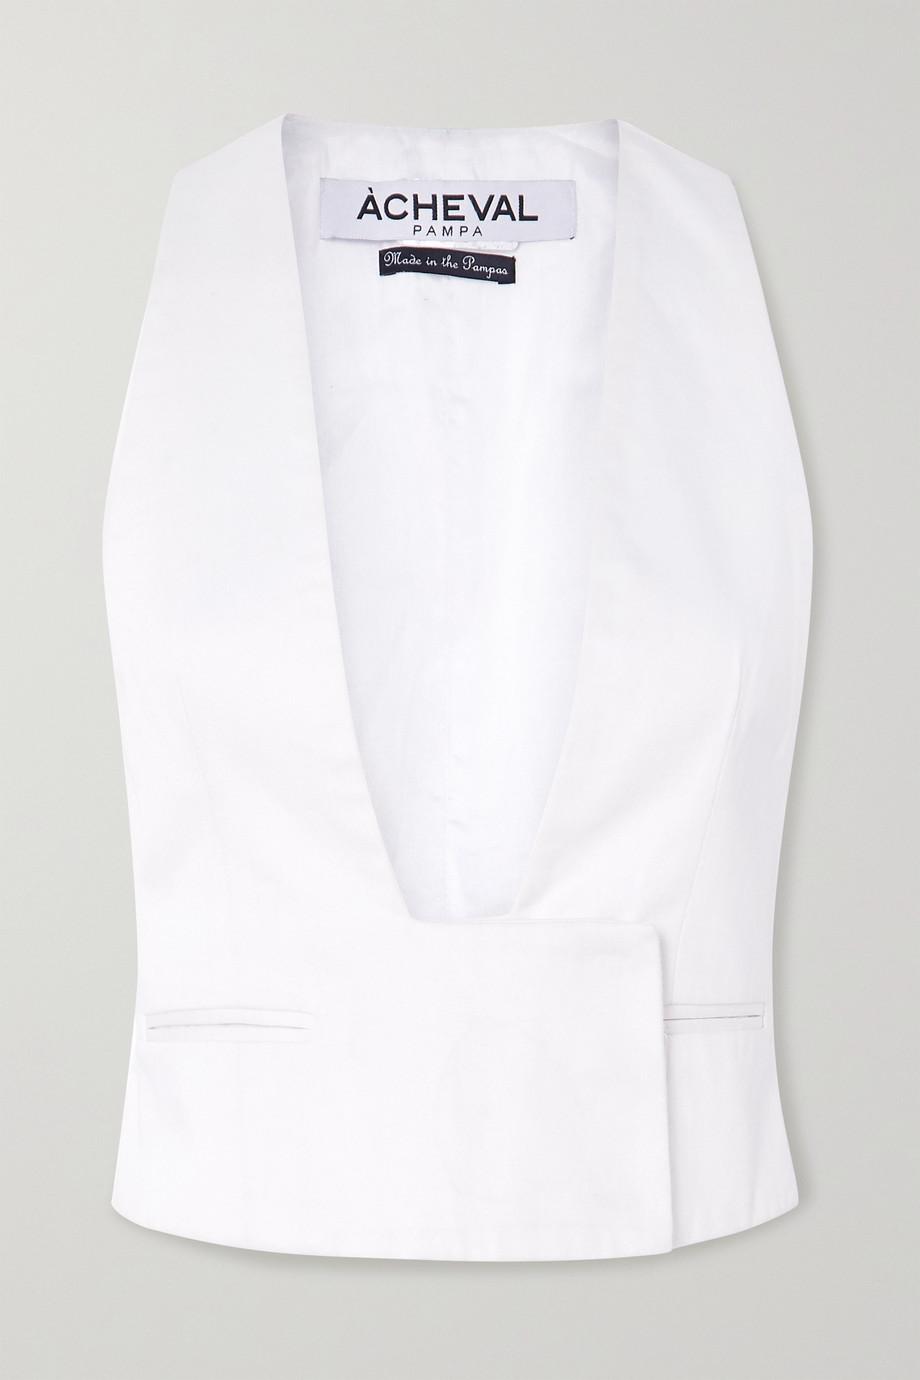 Àcheval Pampa Gardel cotton-blend vest